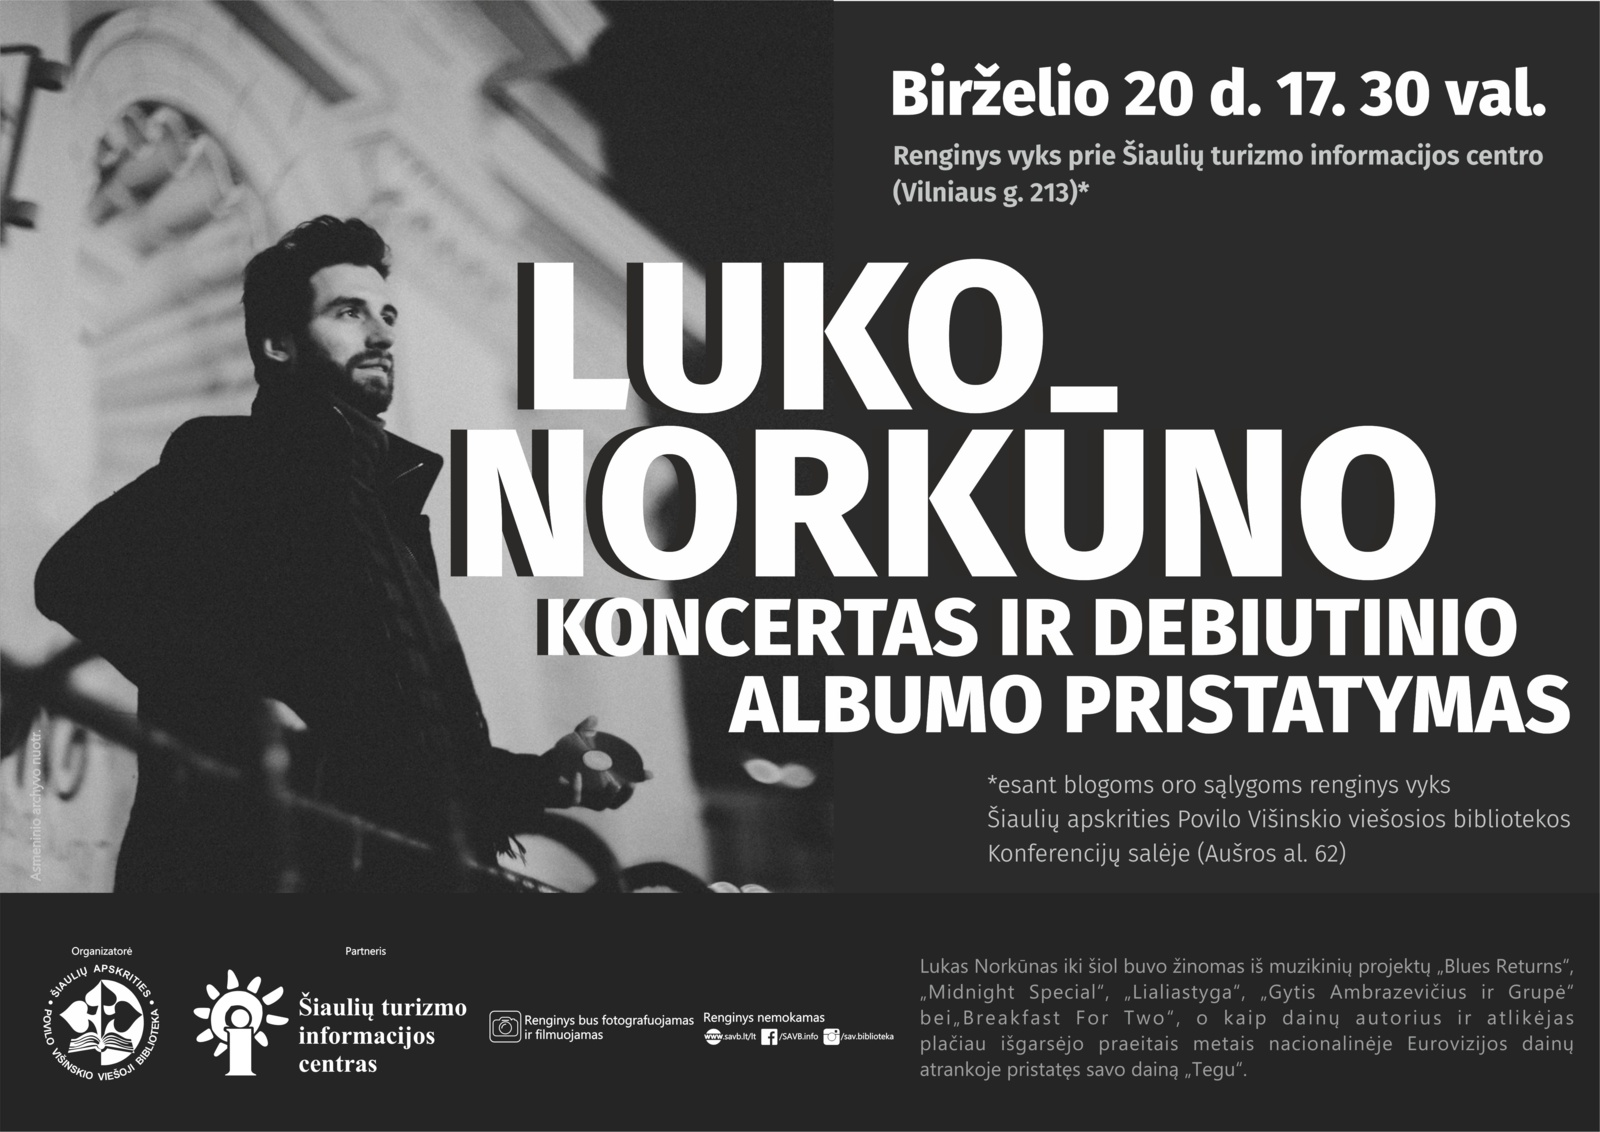 Luko Norkūno koncertas